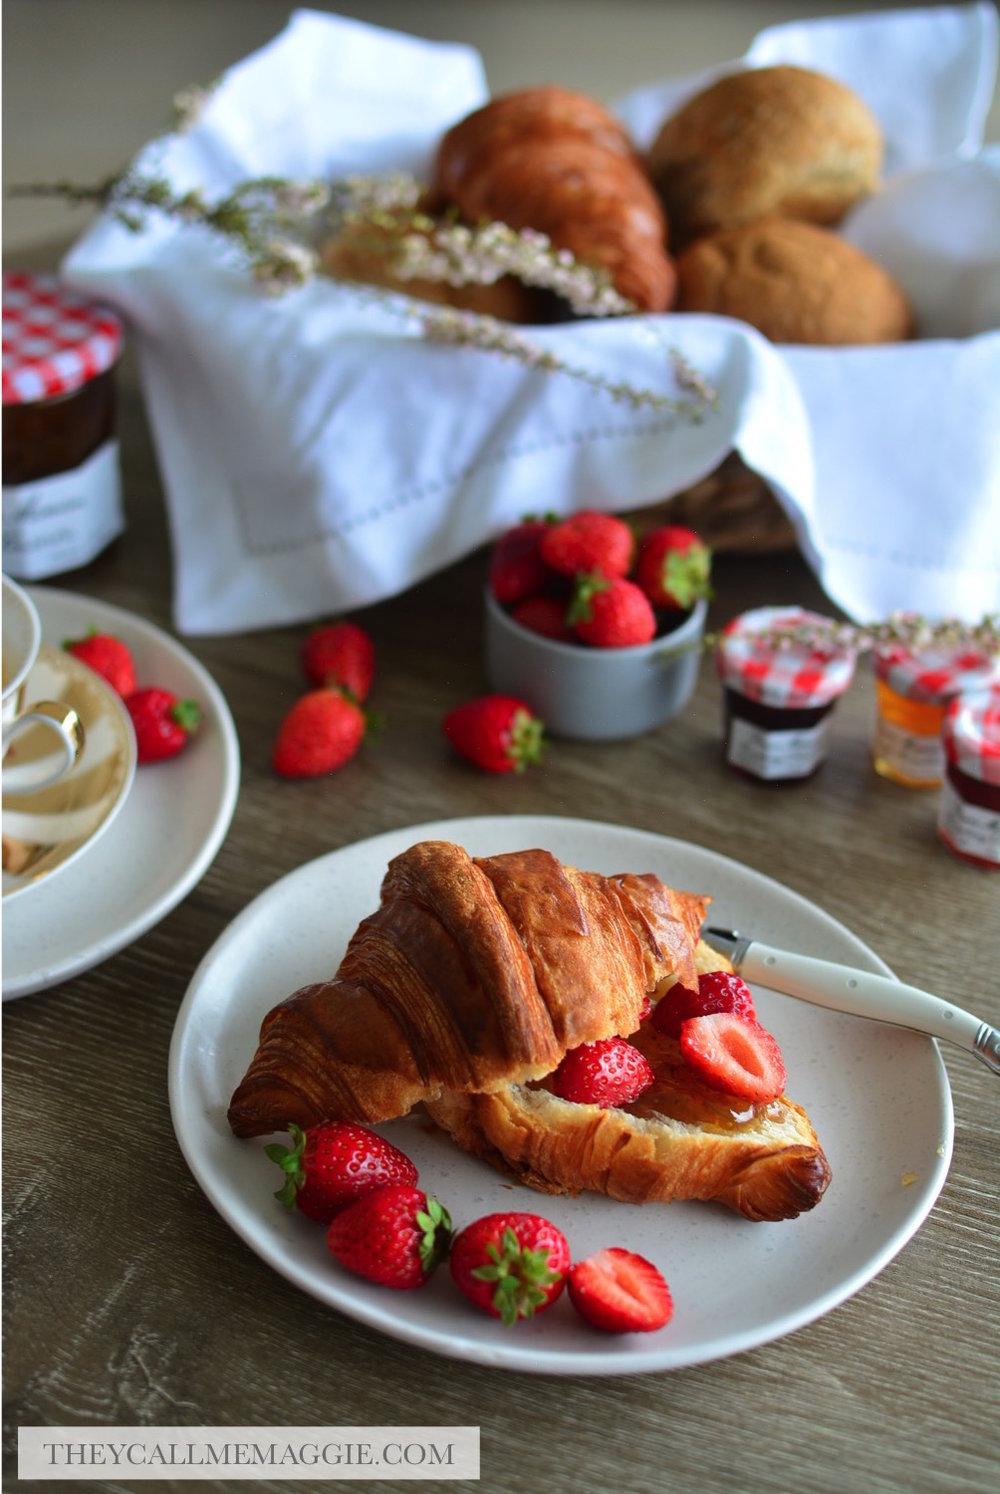 pastries-strawberry-jam.jpg